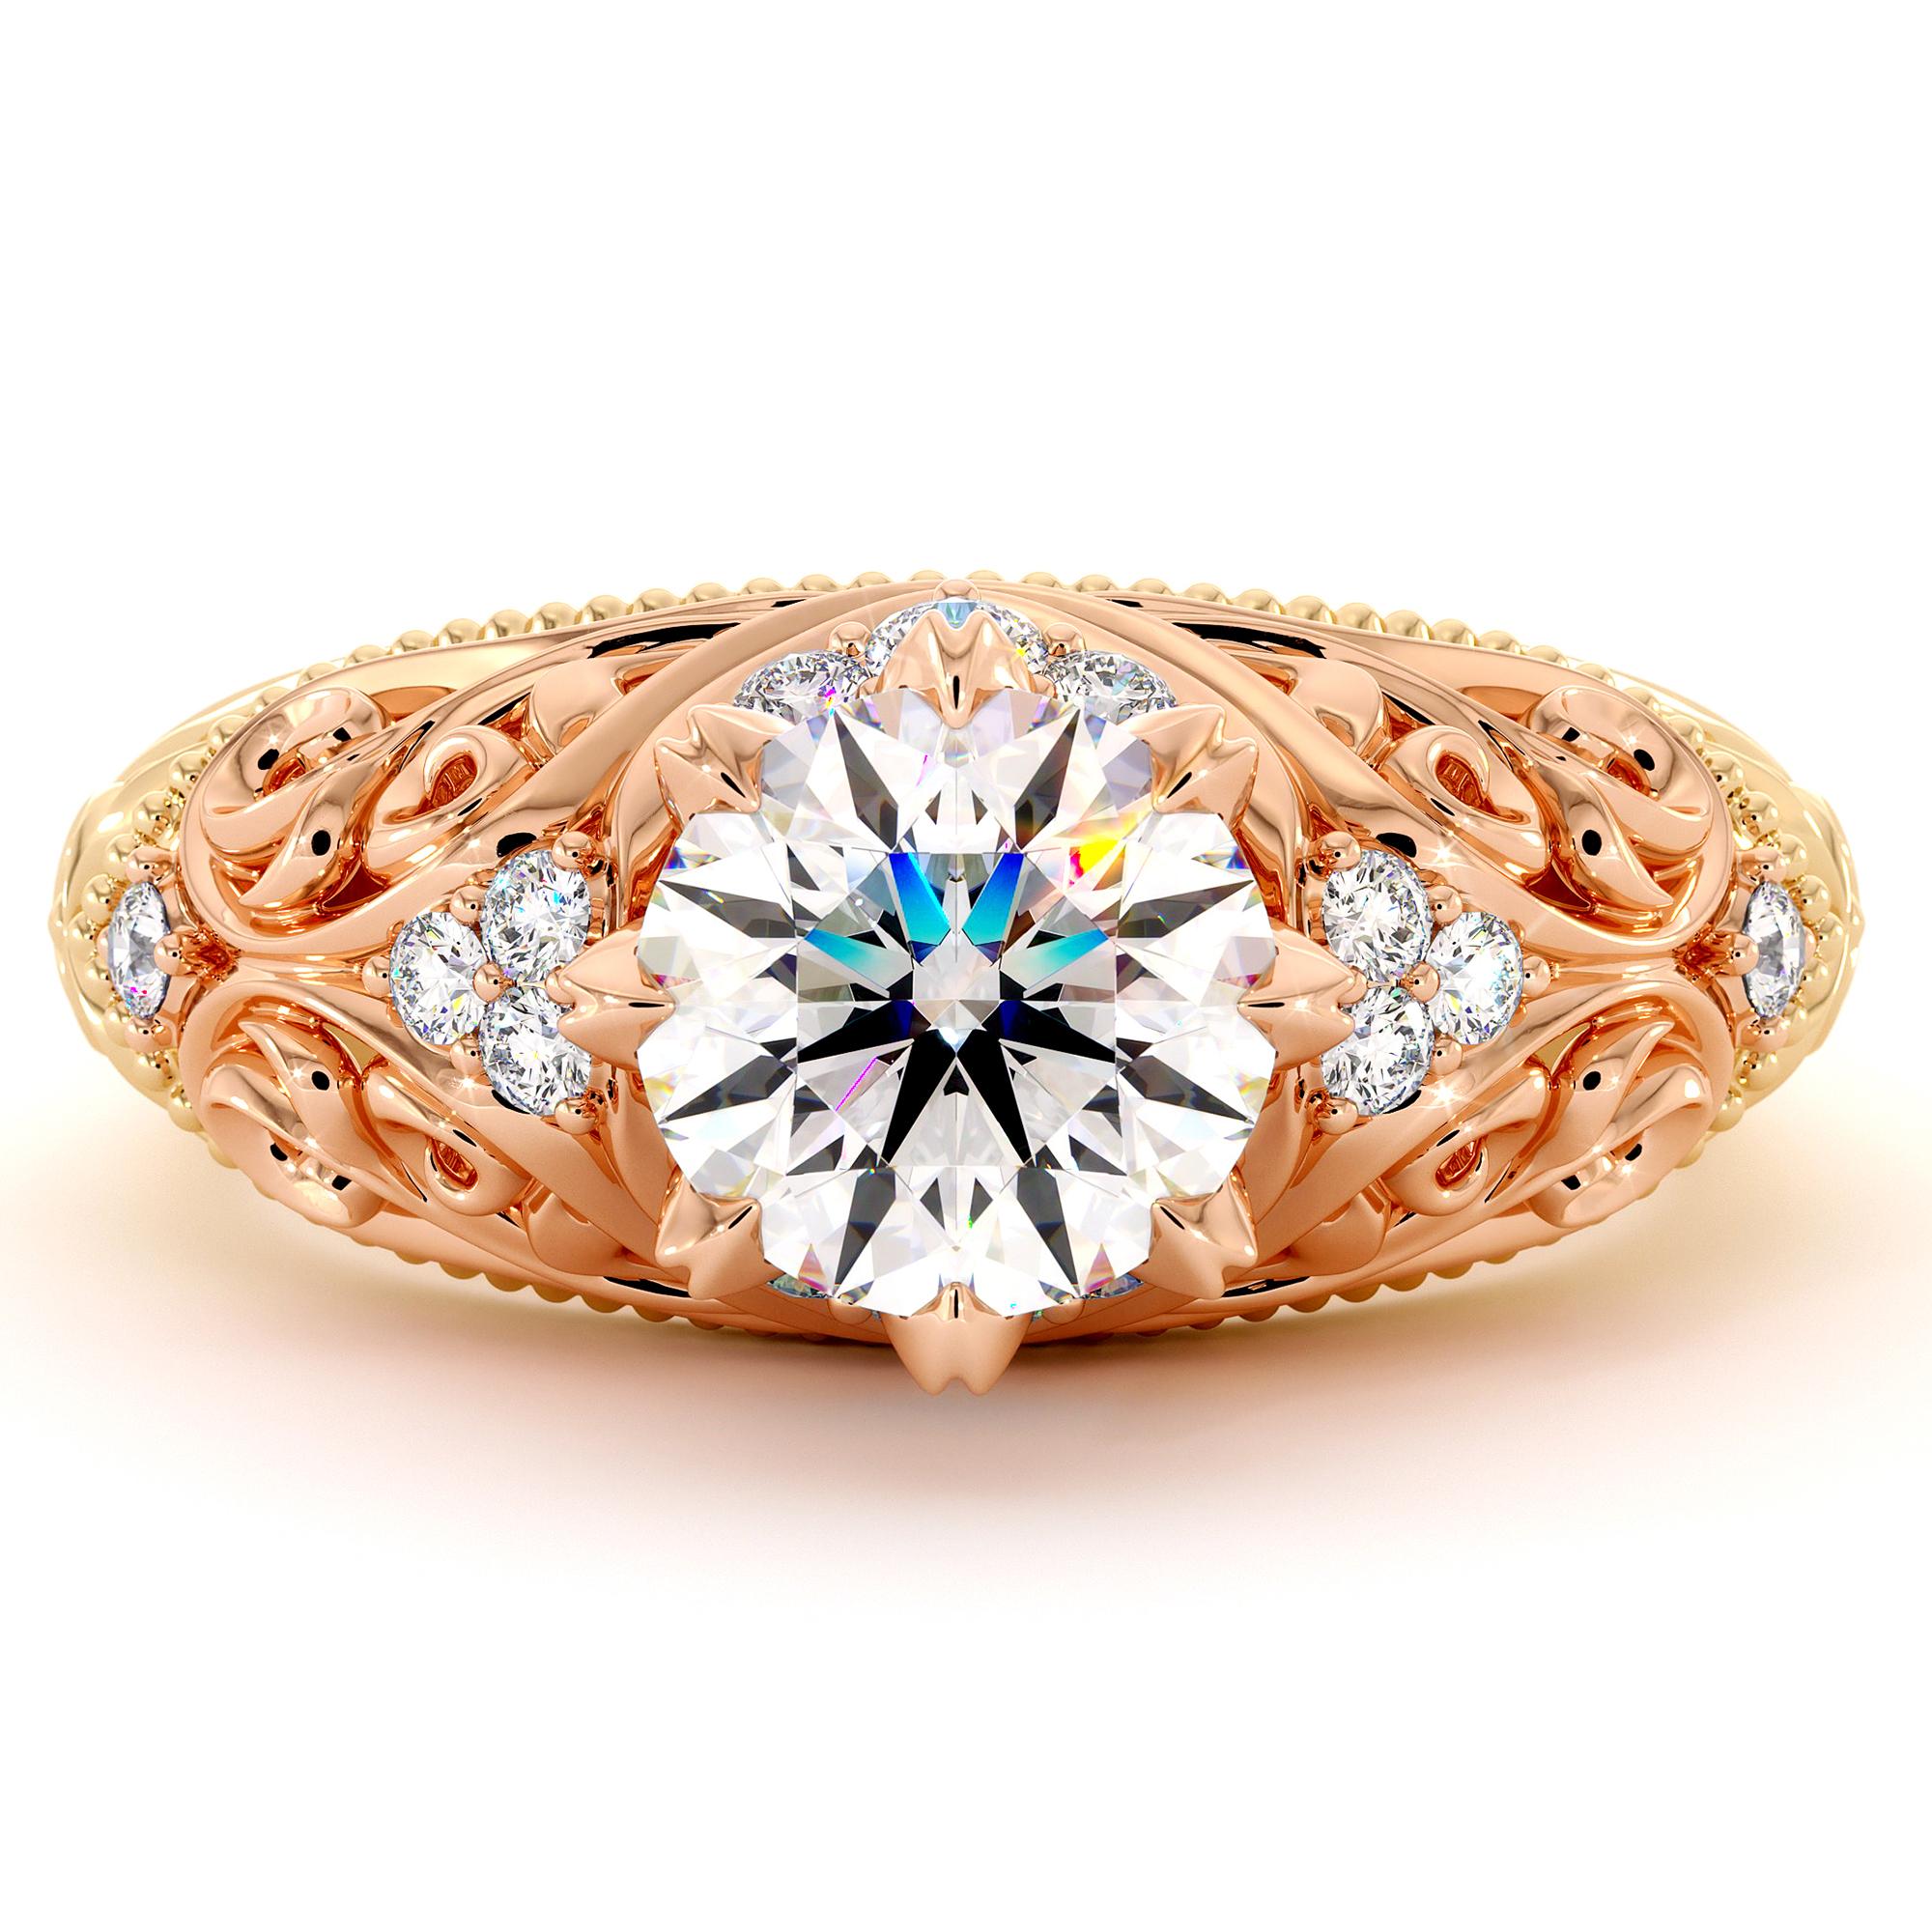 Unique Art Nouveau Moissanite Engagement Ring 1.55 Ct. Round Moissanite Ring Royal 2 Tone Gold Milgrain Filigree Engagement Ring